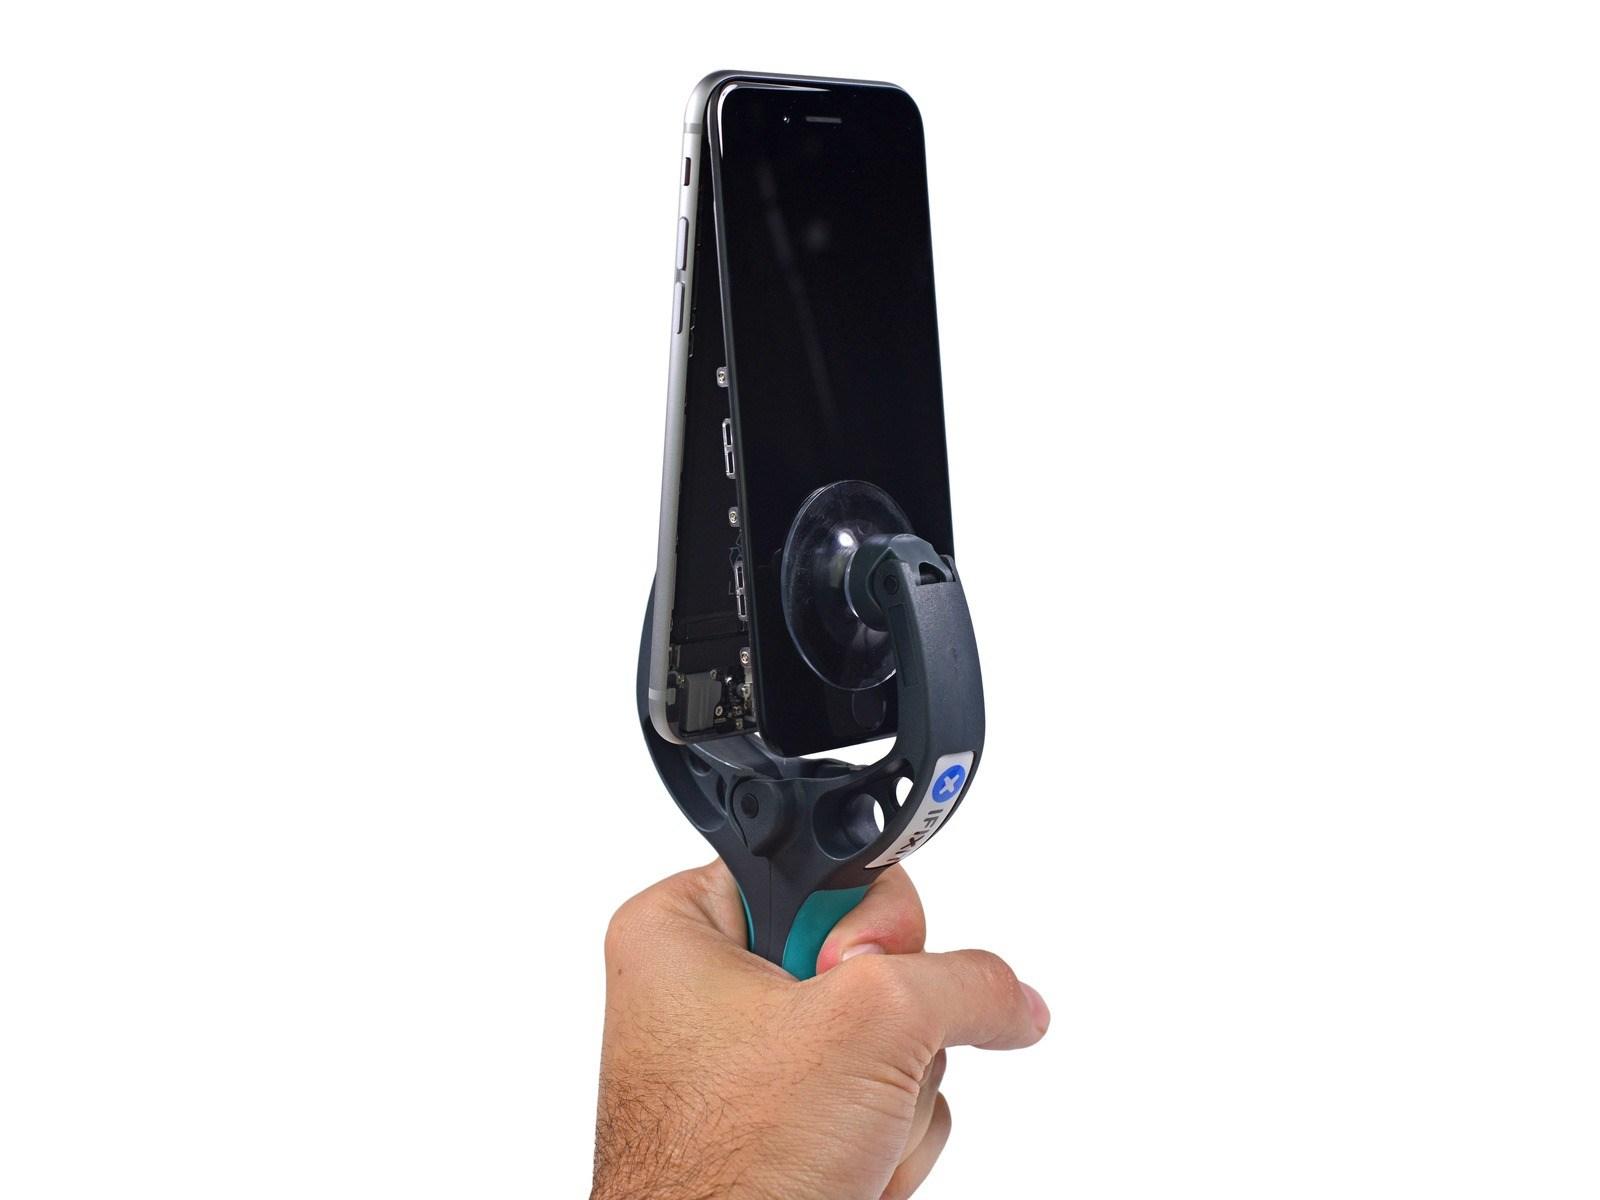 iFixIt: Reparieren des iPhone 6 (Plus) ist kein Problem mehr ...